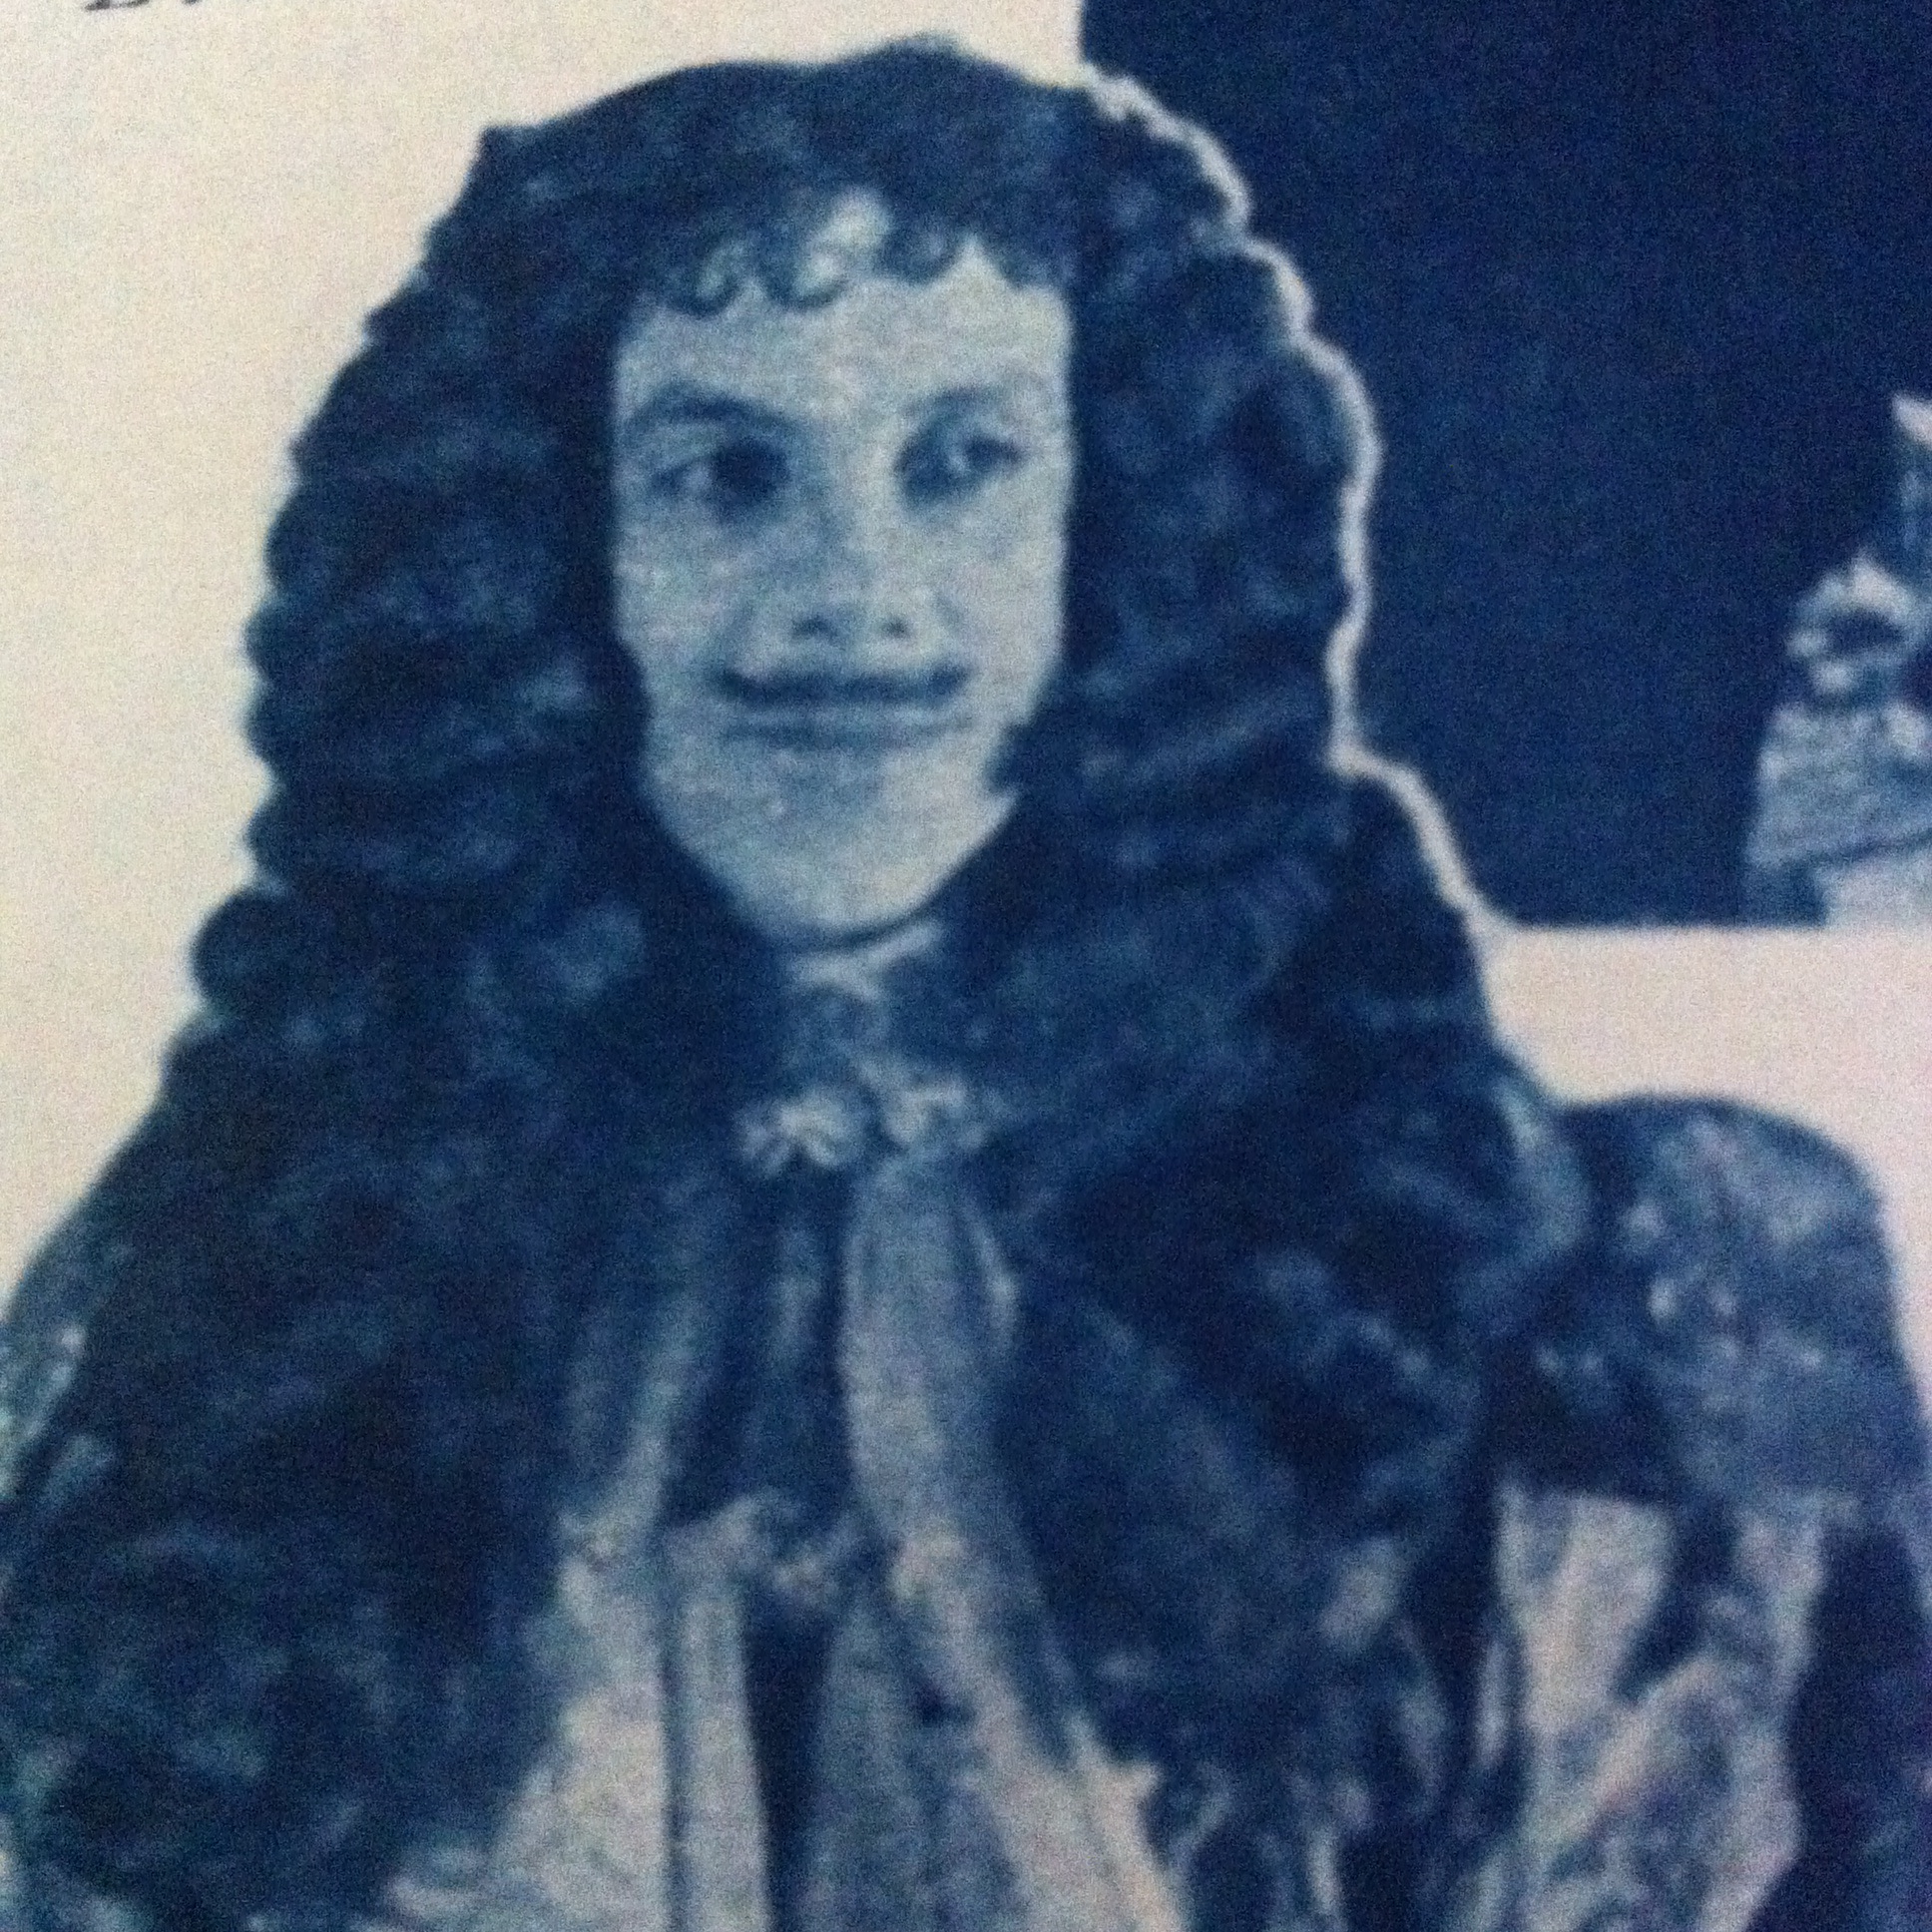 Constance Collier,Charmion King Erotic pics Angie Martinez,Doris Dawson